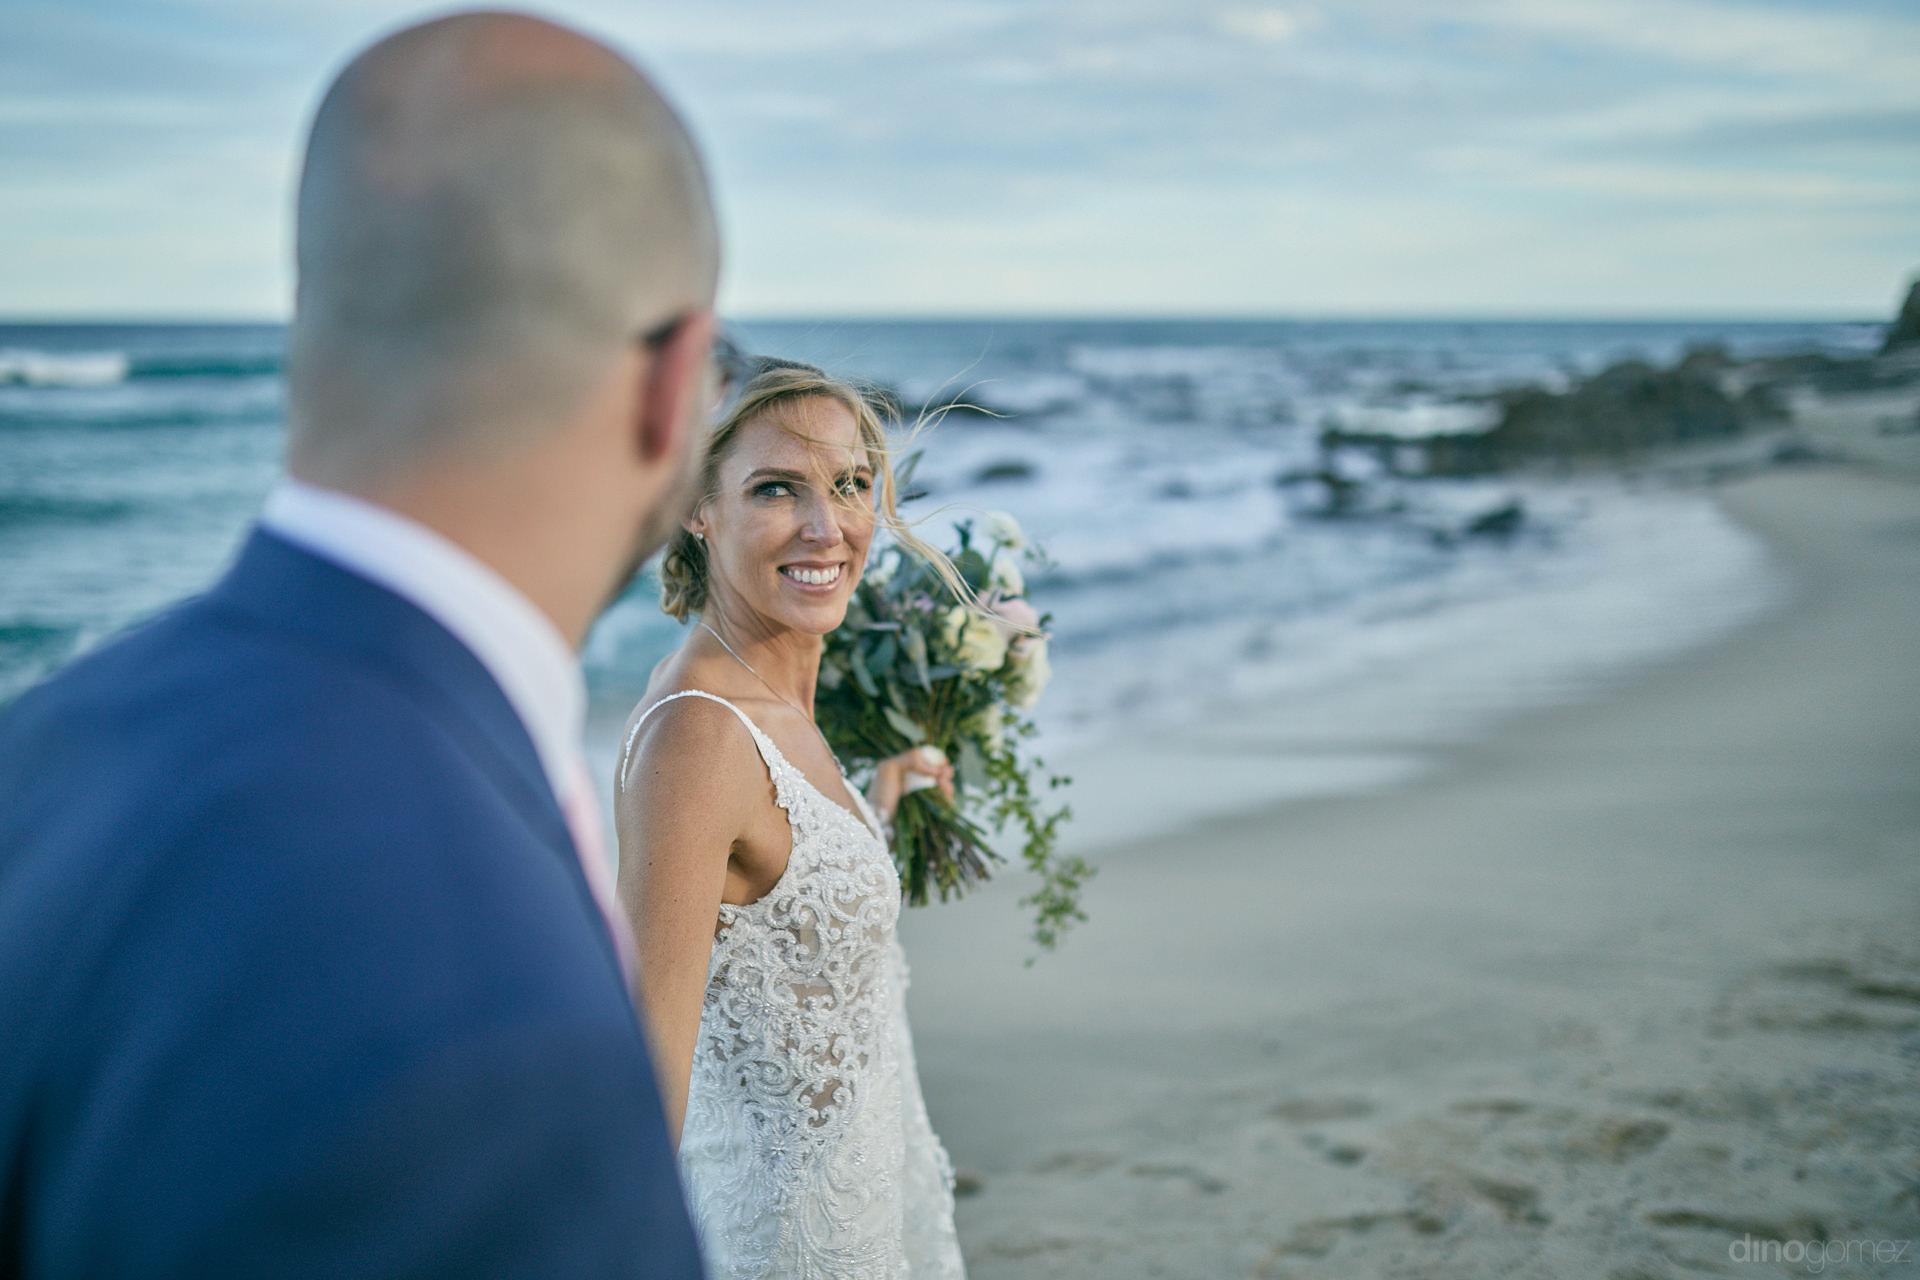 Wedding Photographer In Cabo San Lucas Unexpected Beach Moment - Mm